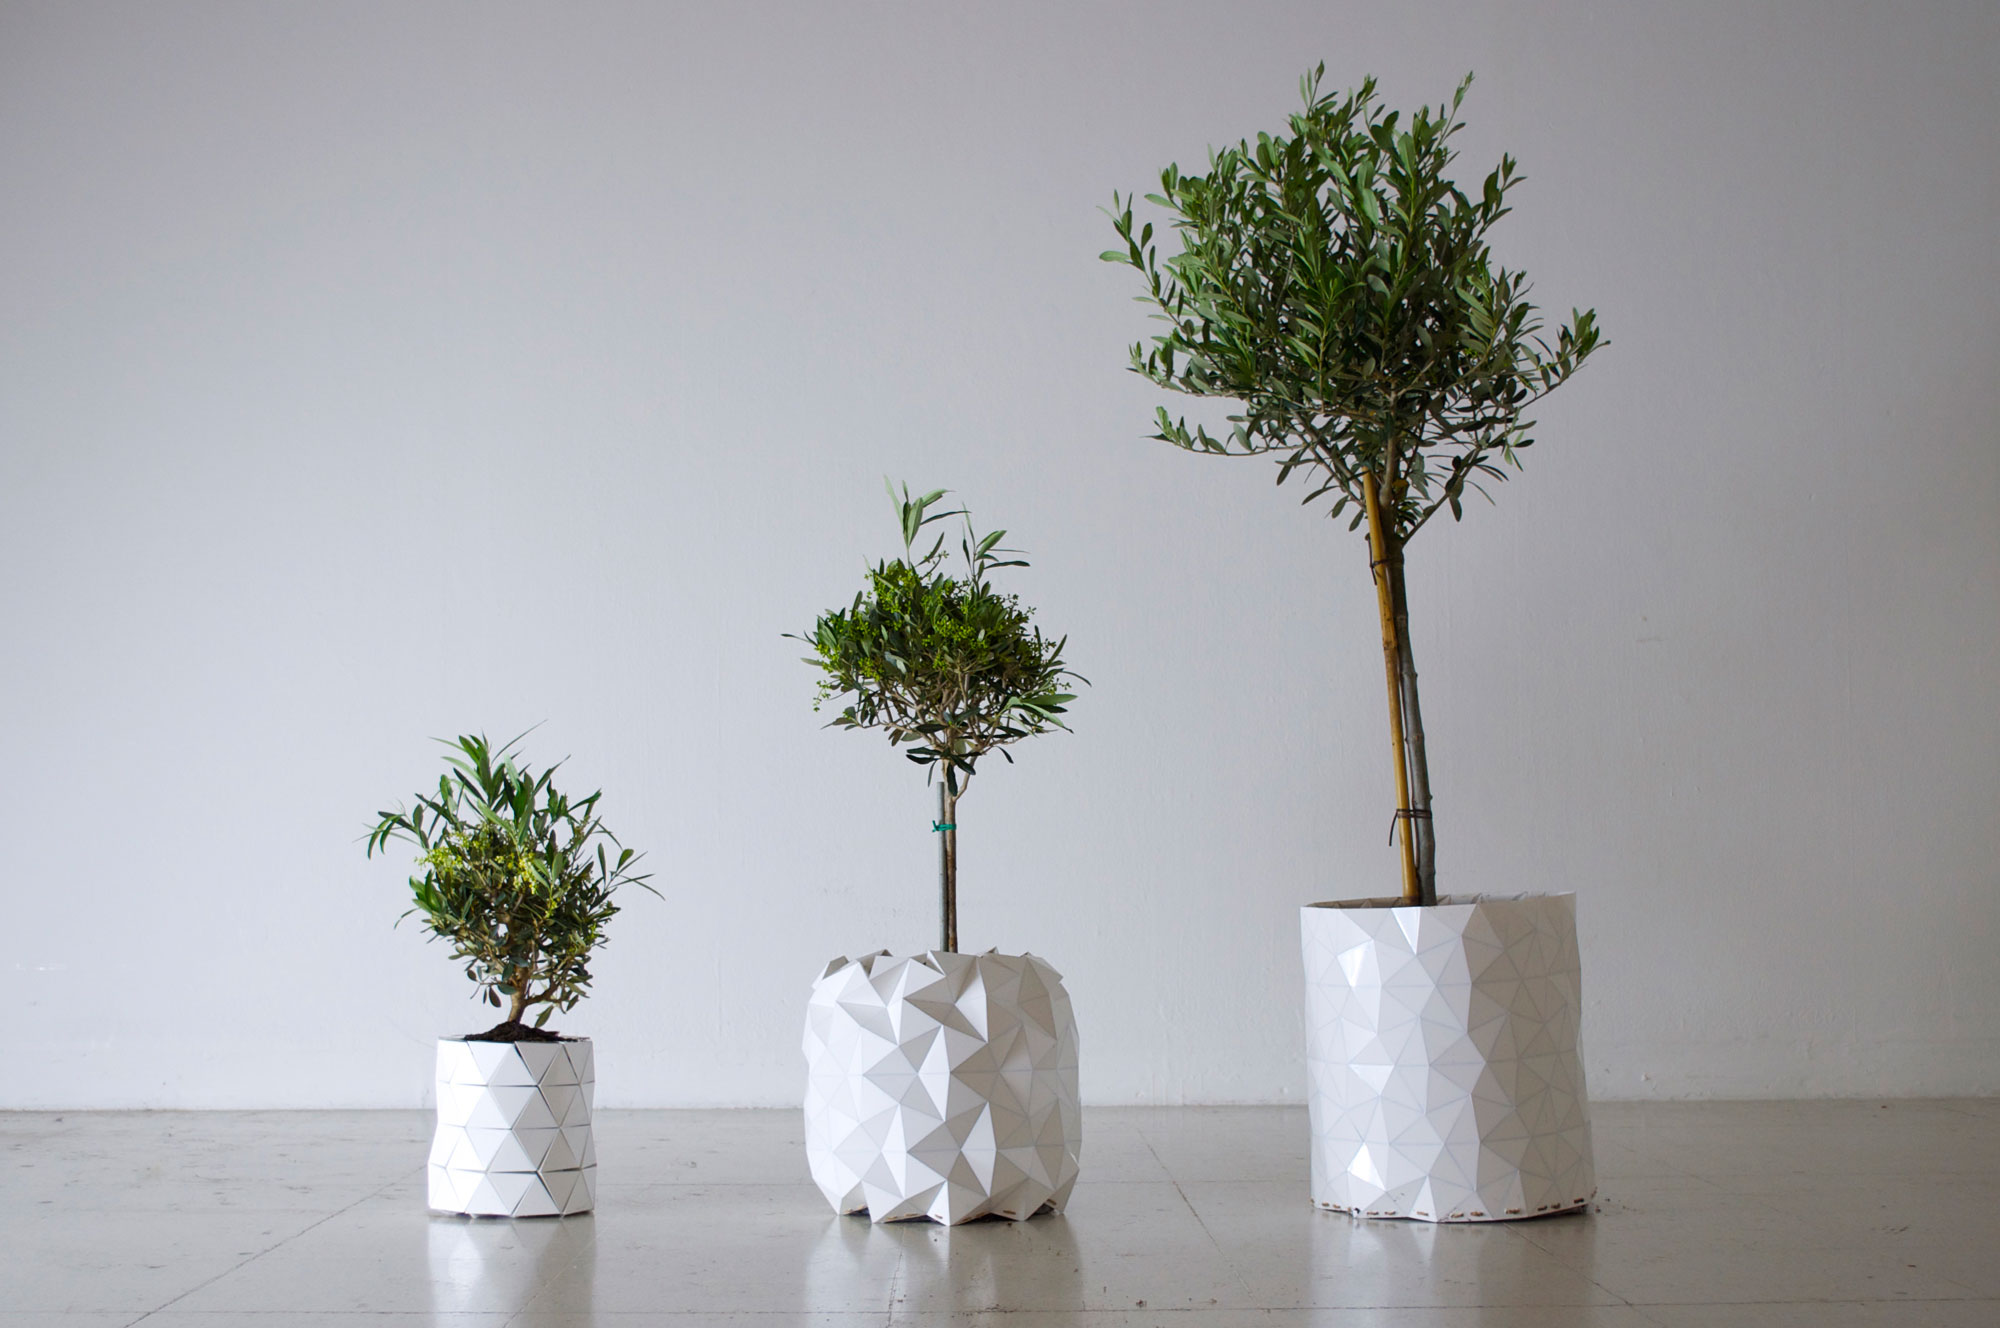 Studio-Ayaskan-Growth-Origami-Planter6.jpg